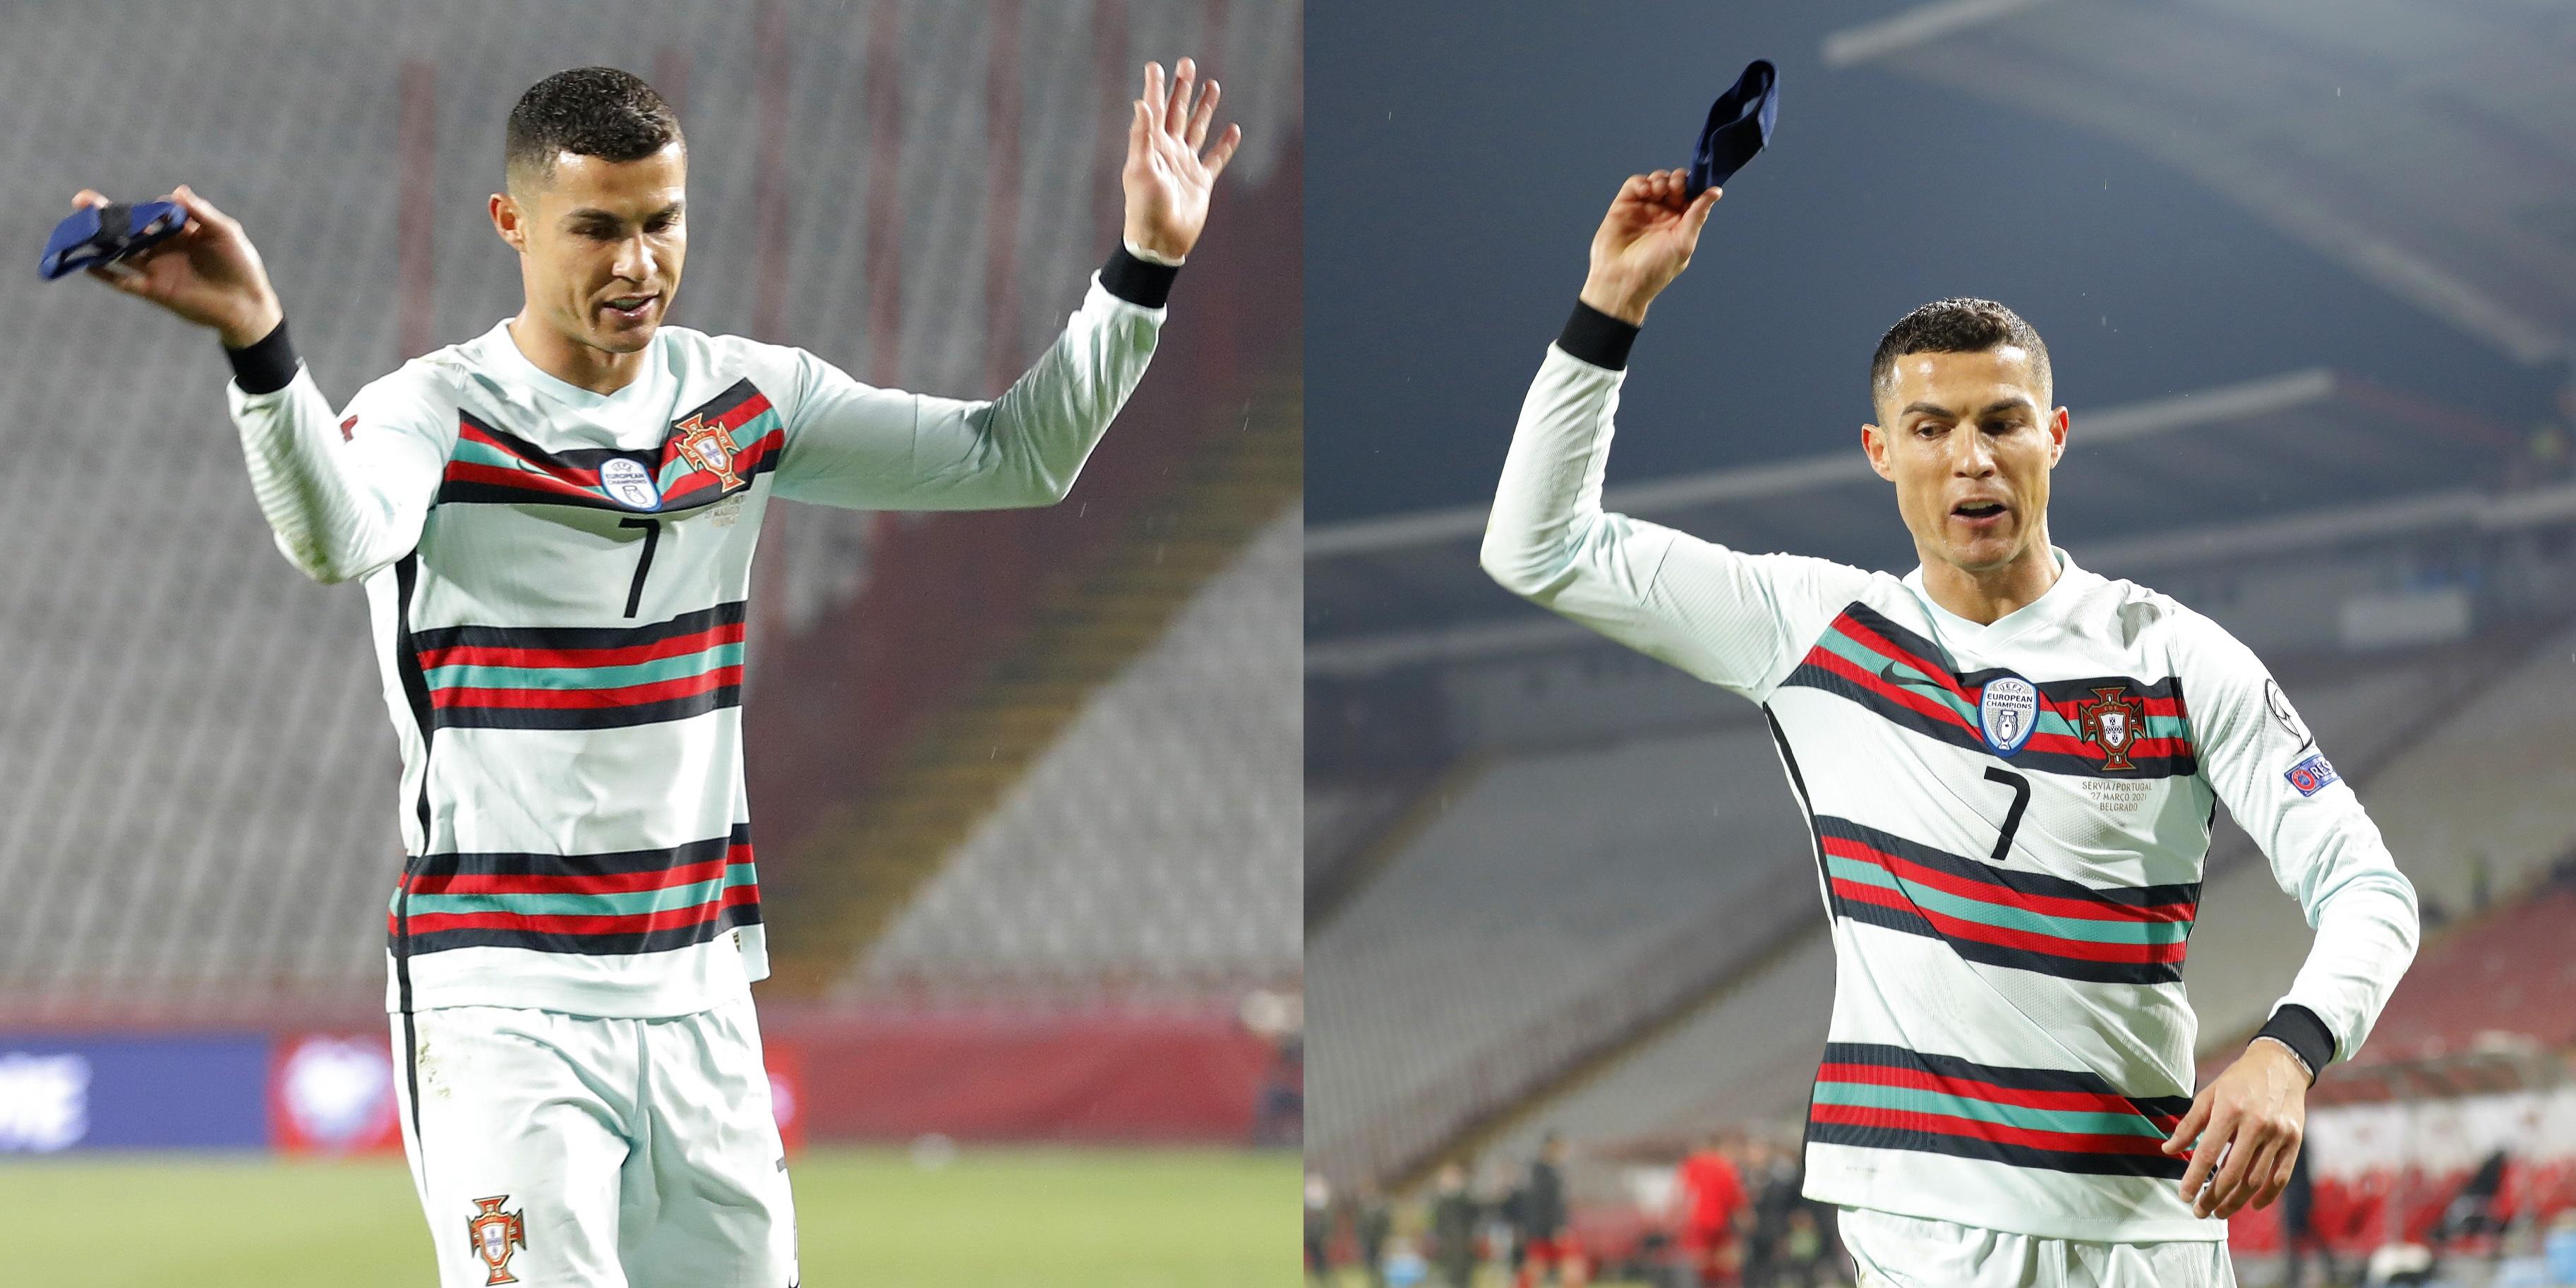 (Video) LFC star Diogo Jota shines as Cristiano Ronaldo throws a strop – Portugal highlights